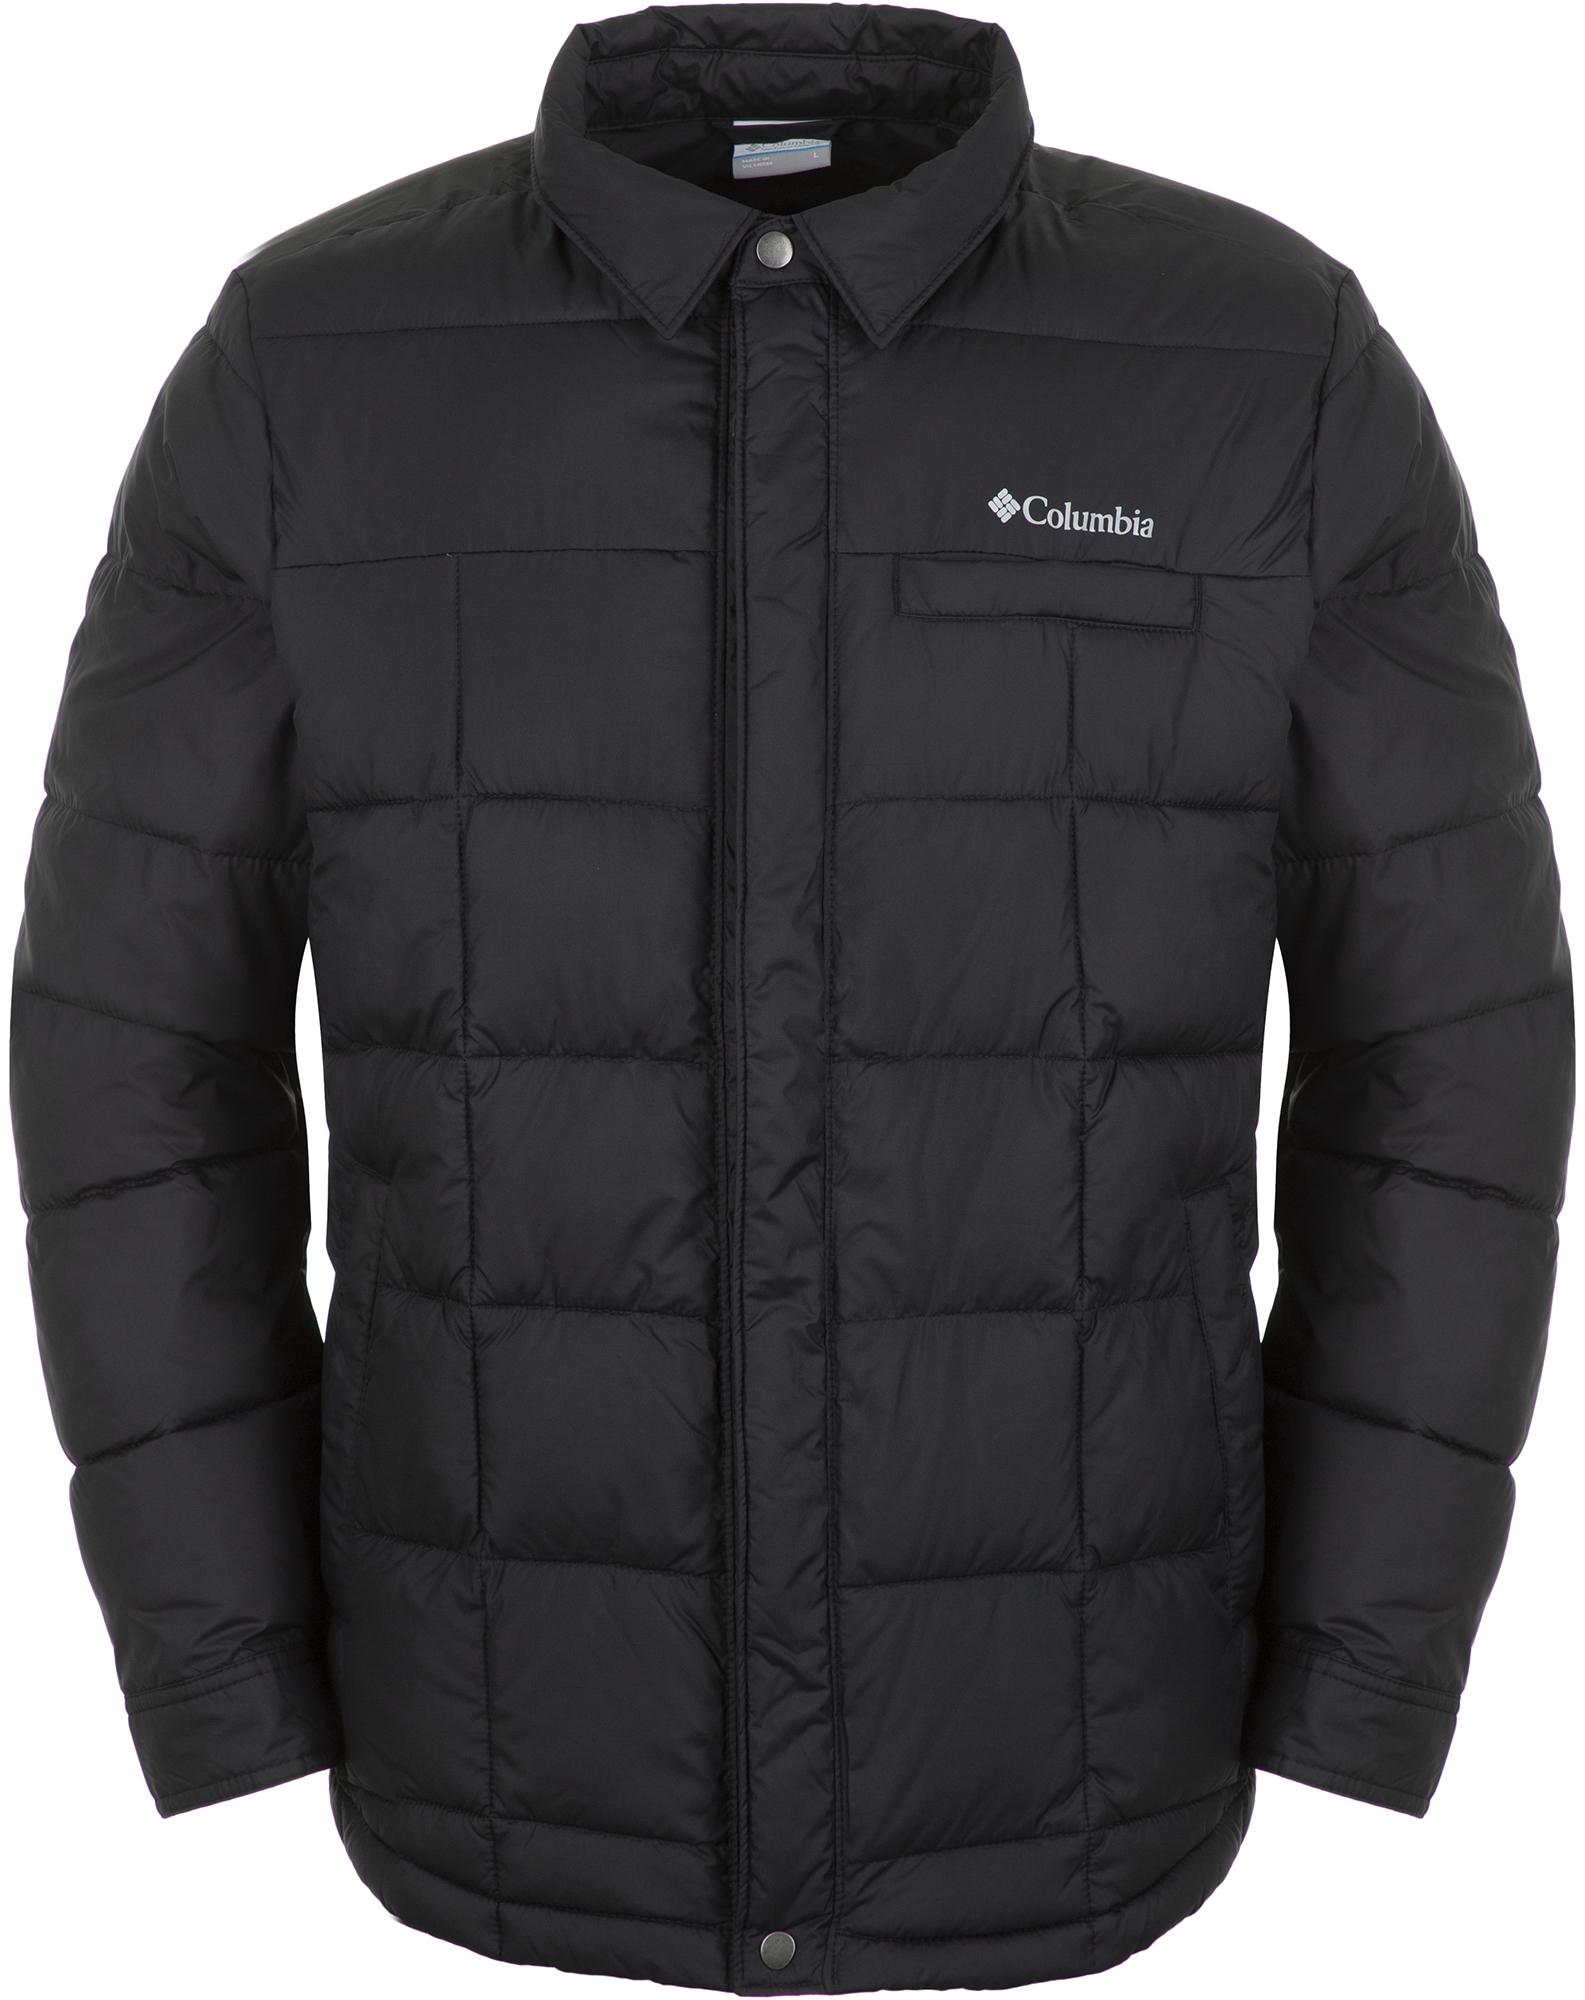 Columbia Куртка утепленная мужская Columbia Booneville, размер 54 цена